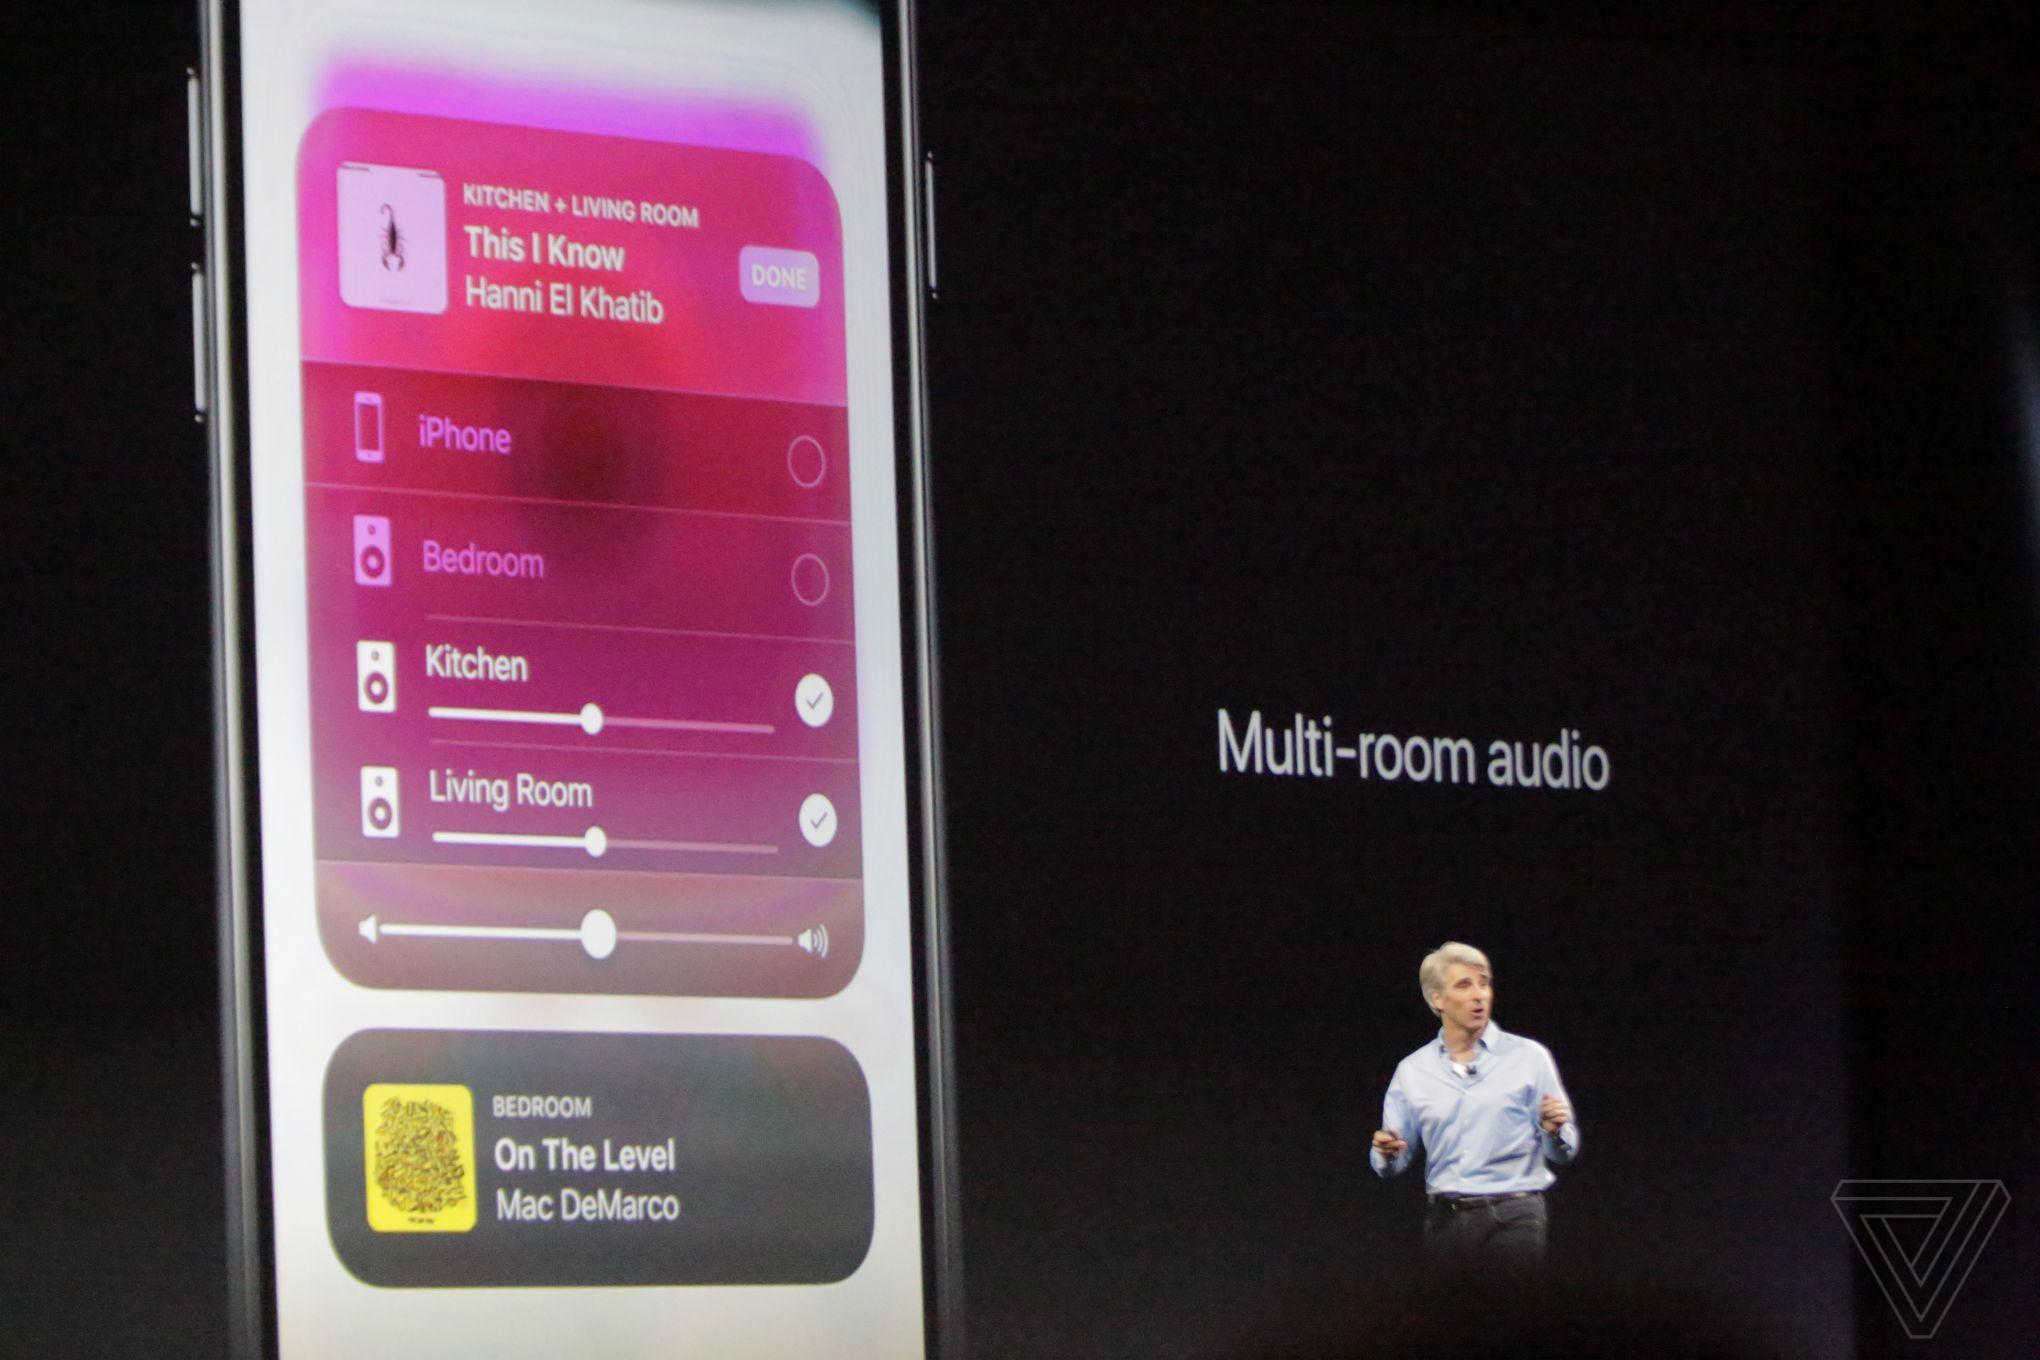 iOS 11 HomeKit